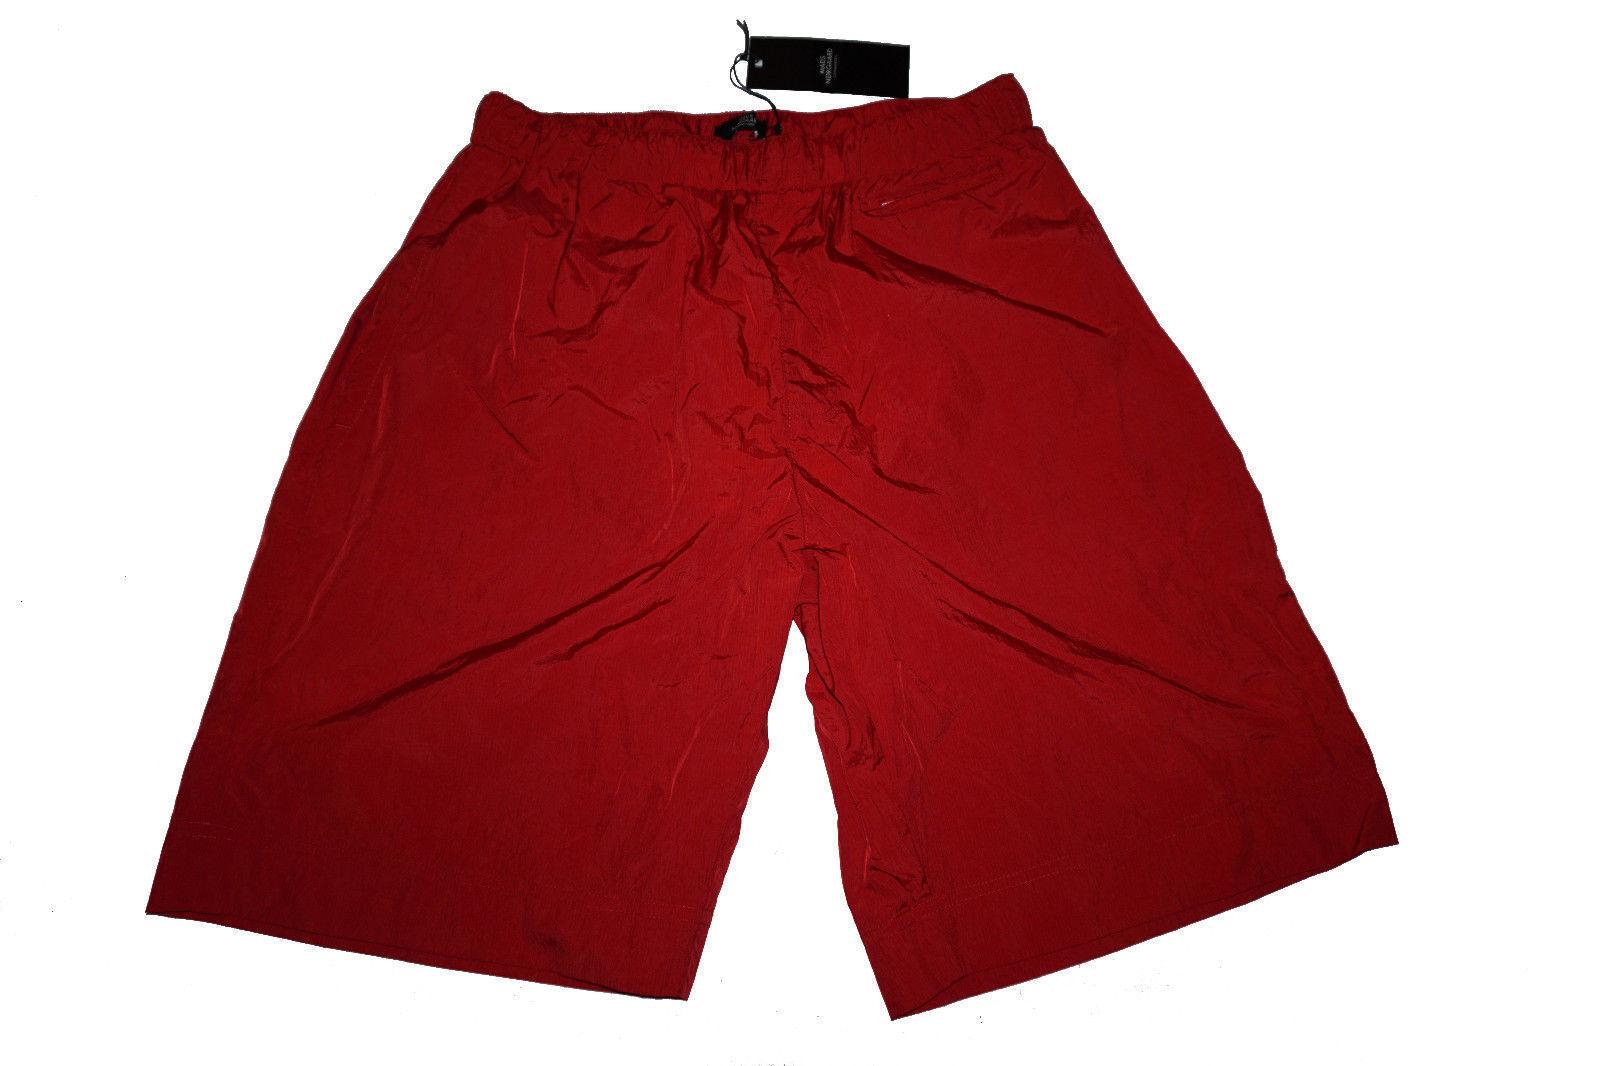 001263600a BNWT MADS NORGAARD MEN'S Swimming Trunks Board Shorts SURF RED orange L  SPEEDO. Polo Ralph Lauren ...